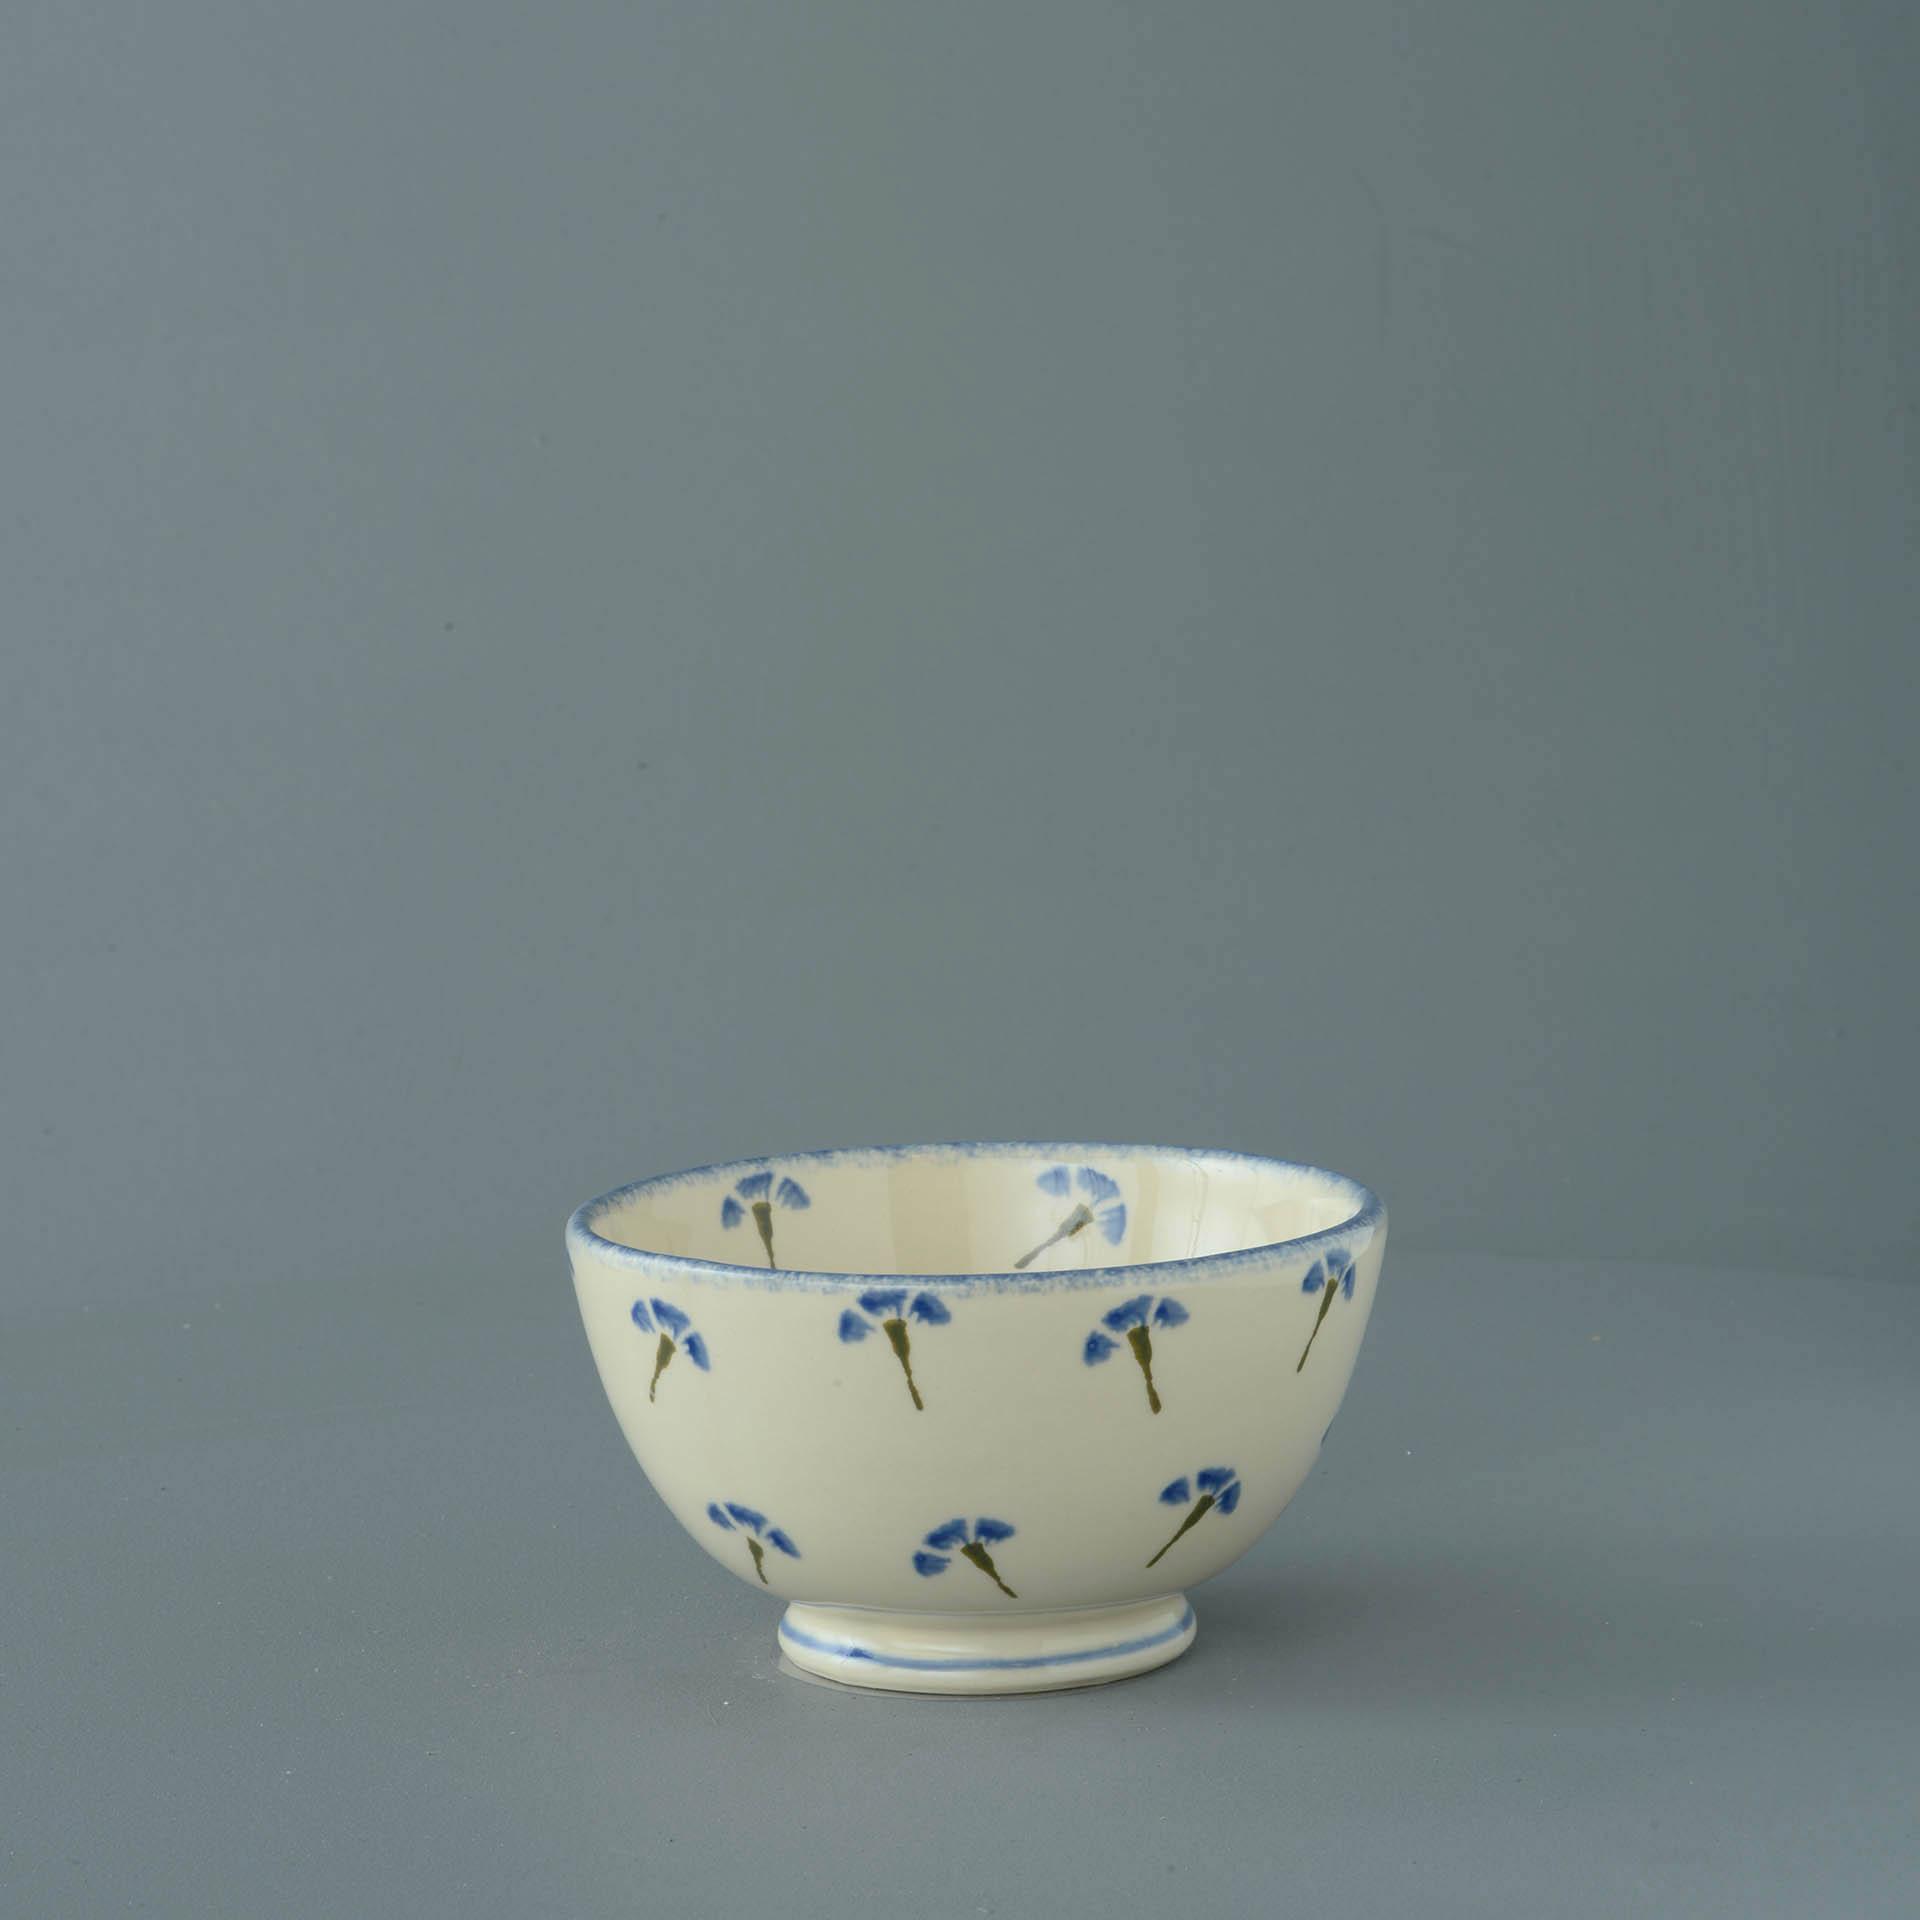 Cornflower Cereal Bowl 7 x 13cm